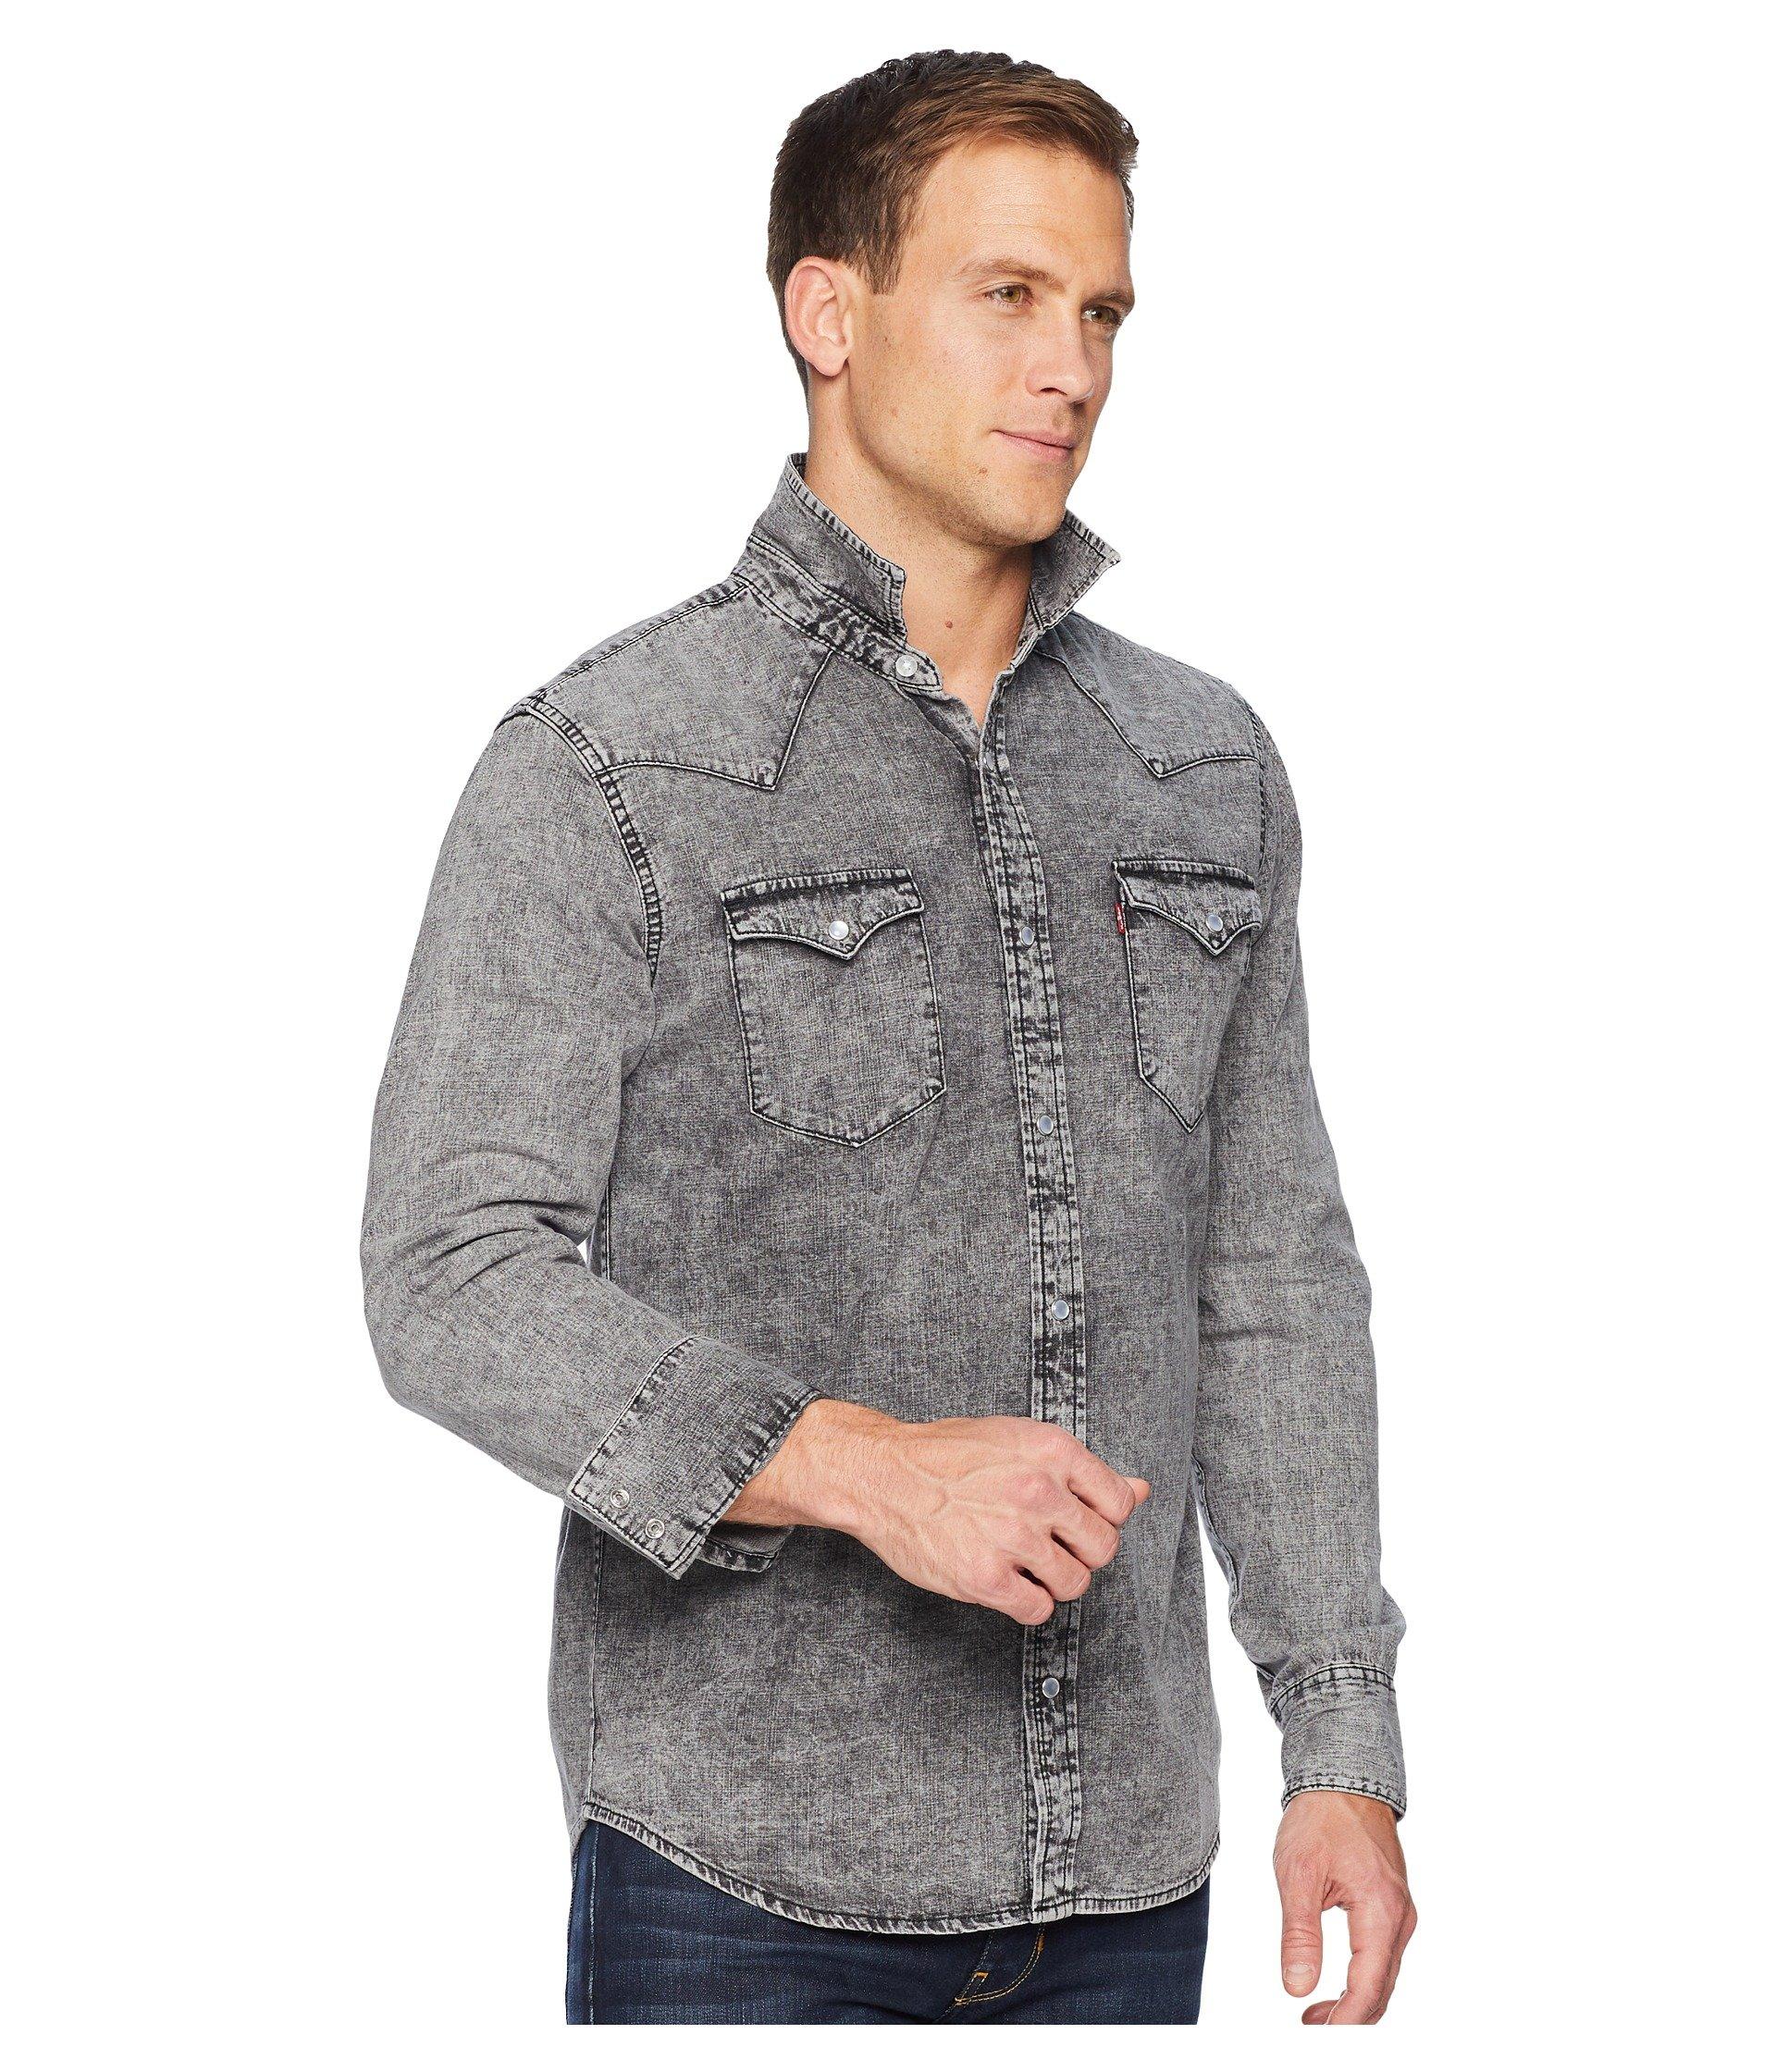 Barstow Grey Levi's® Shirt Western Grey light Hunk Standard qwwB78z